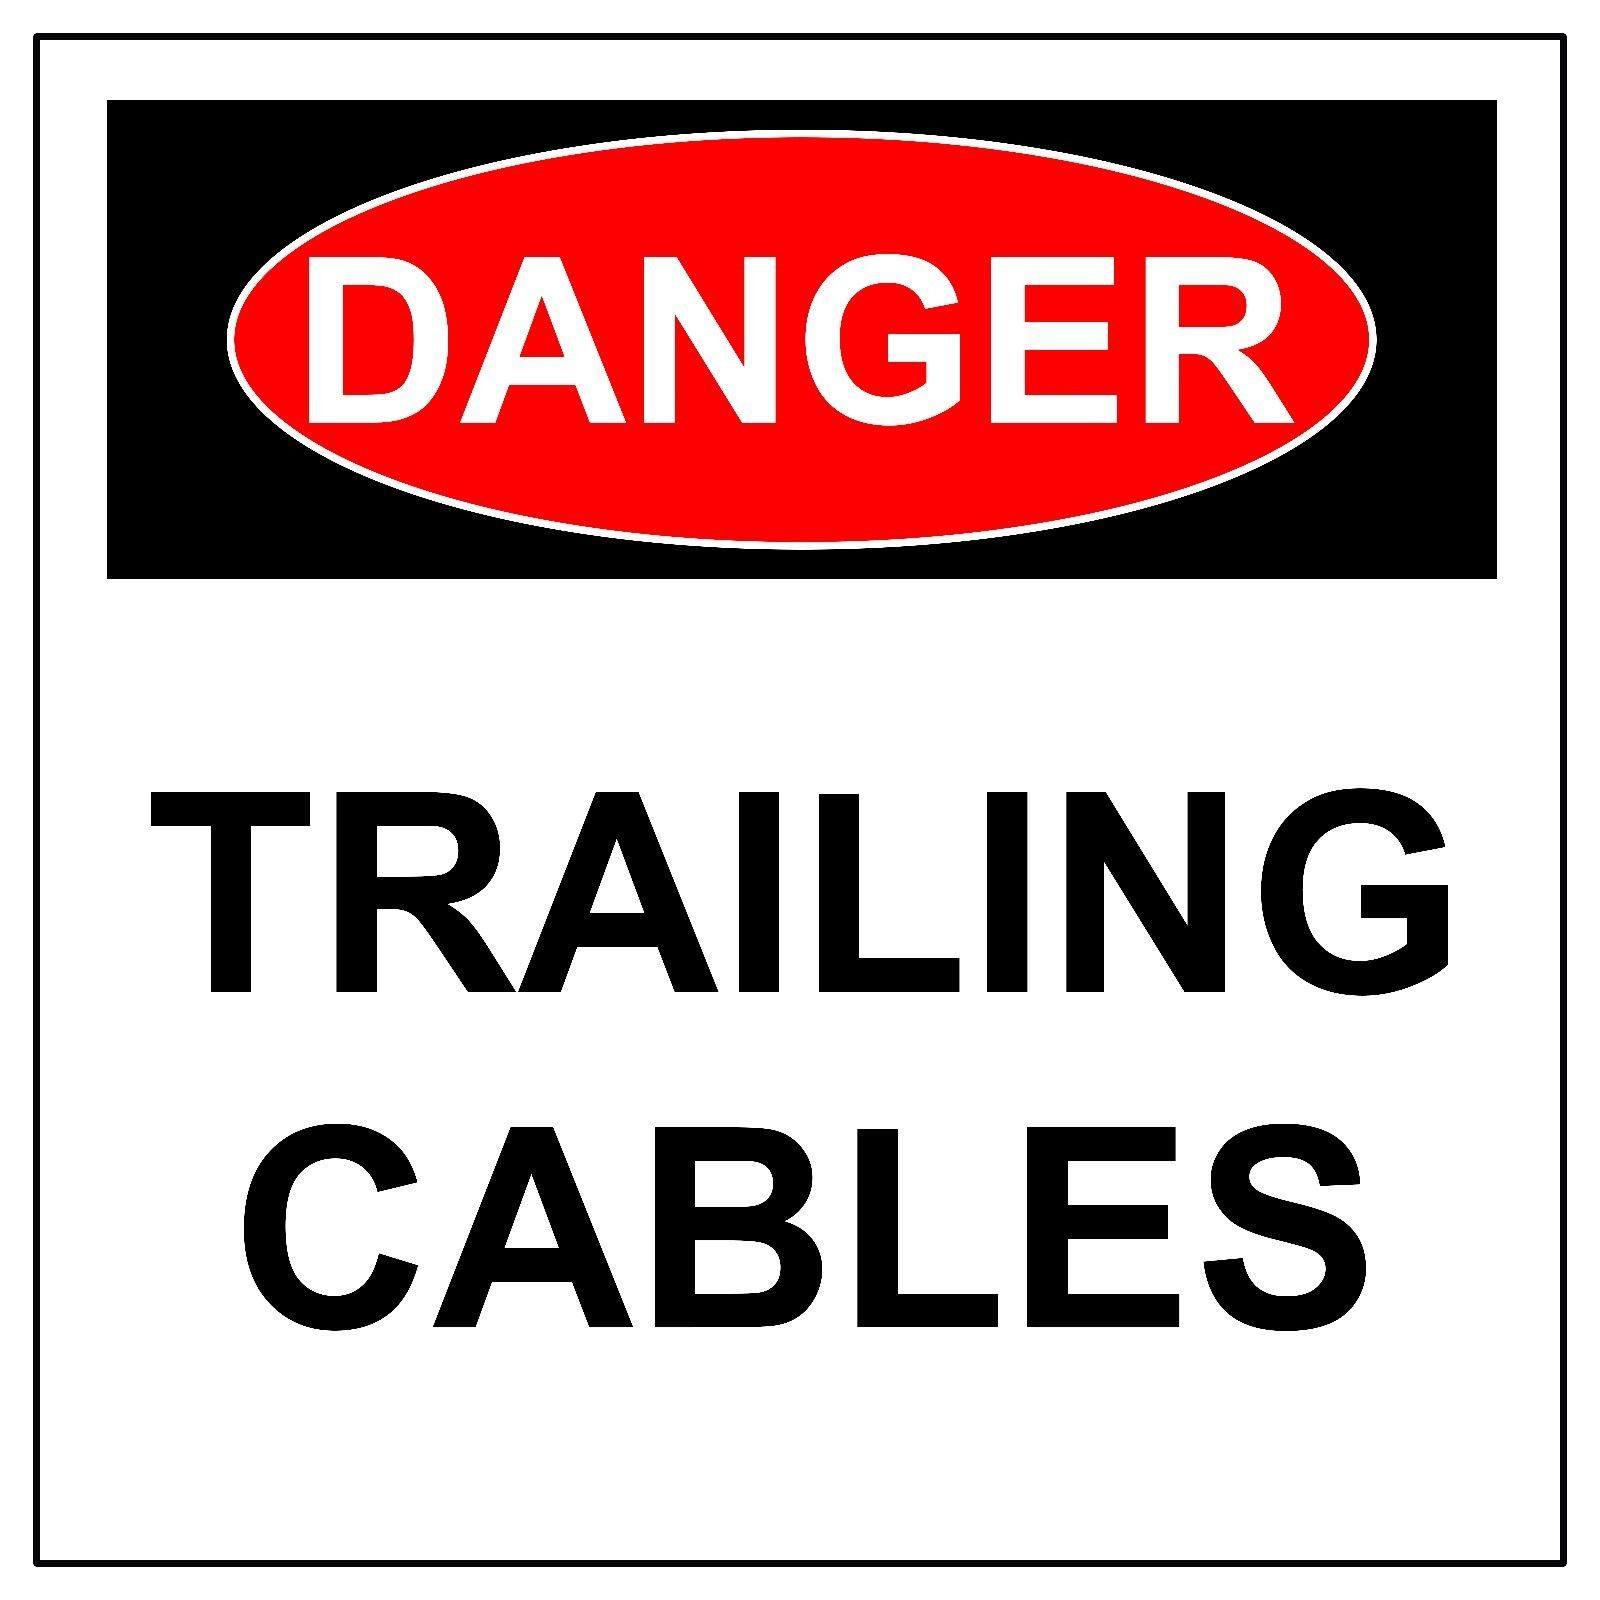 Danger Trailing Cables Signs, Aluminum Metal Safety Warning UV Print Hazard Sign